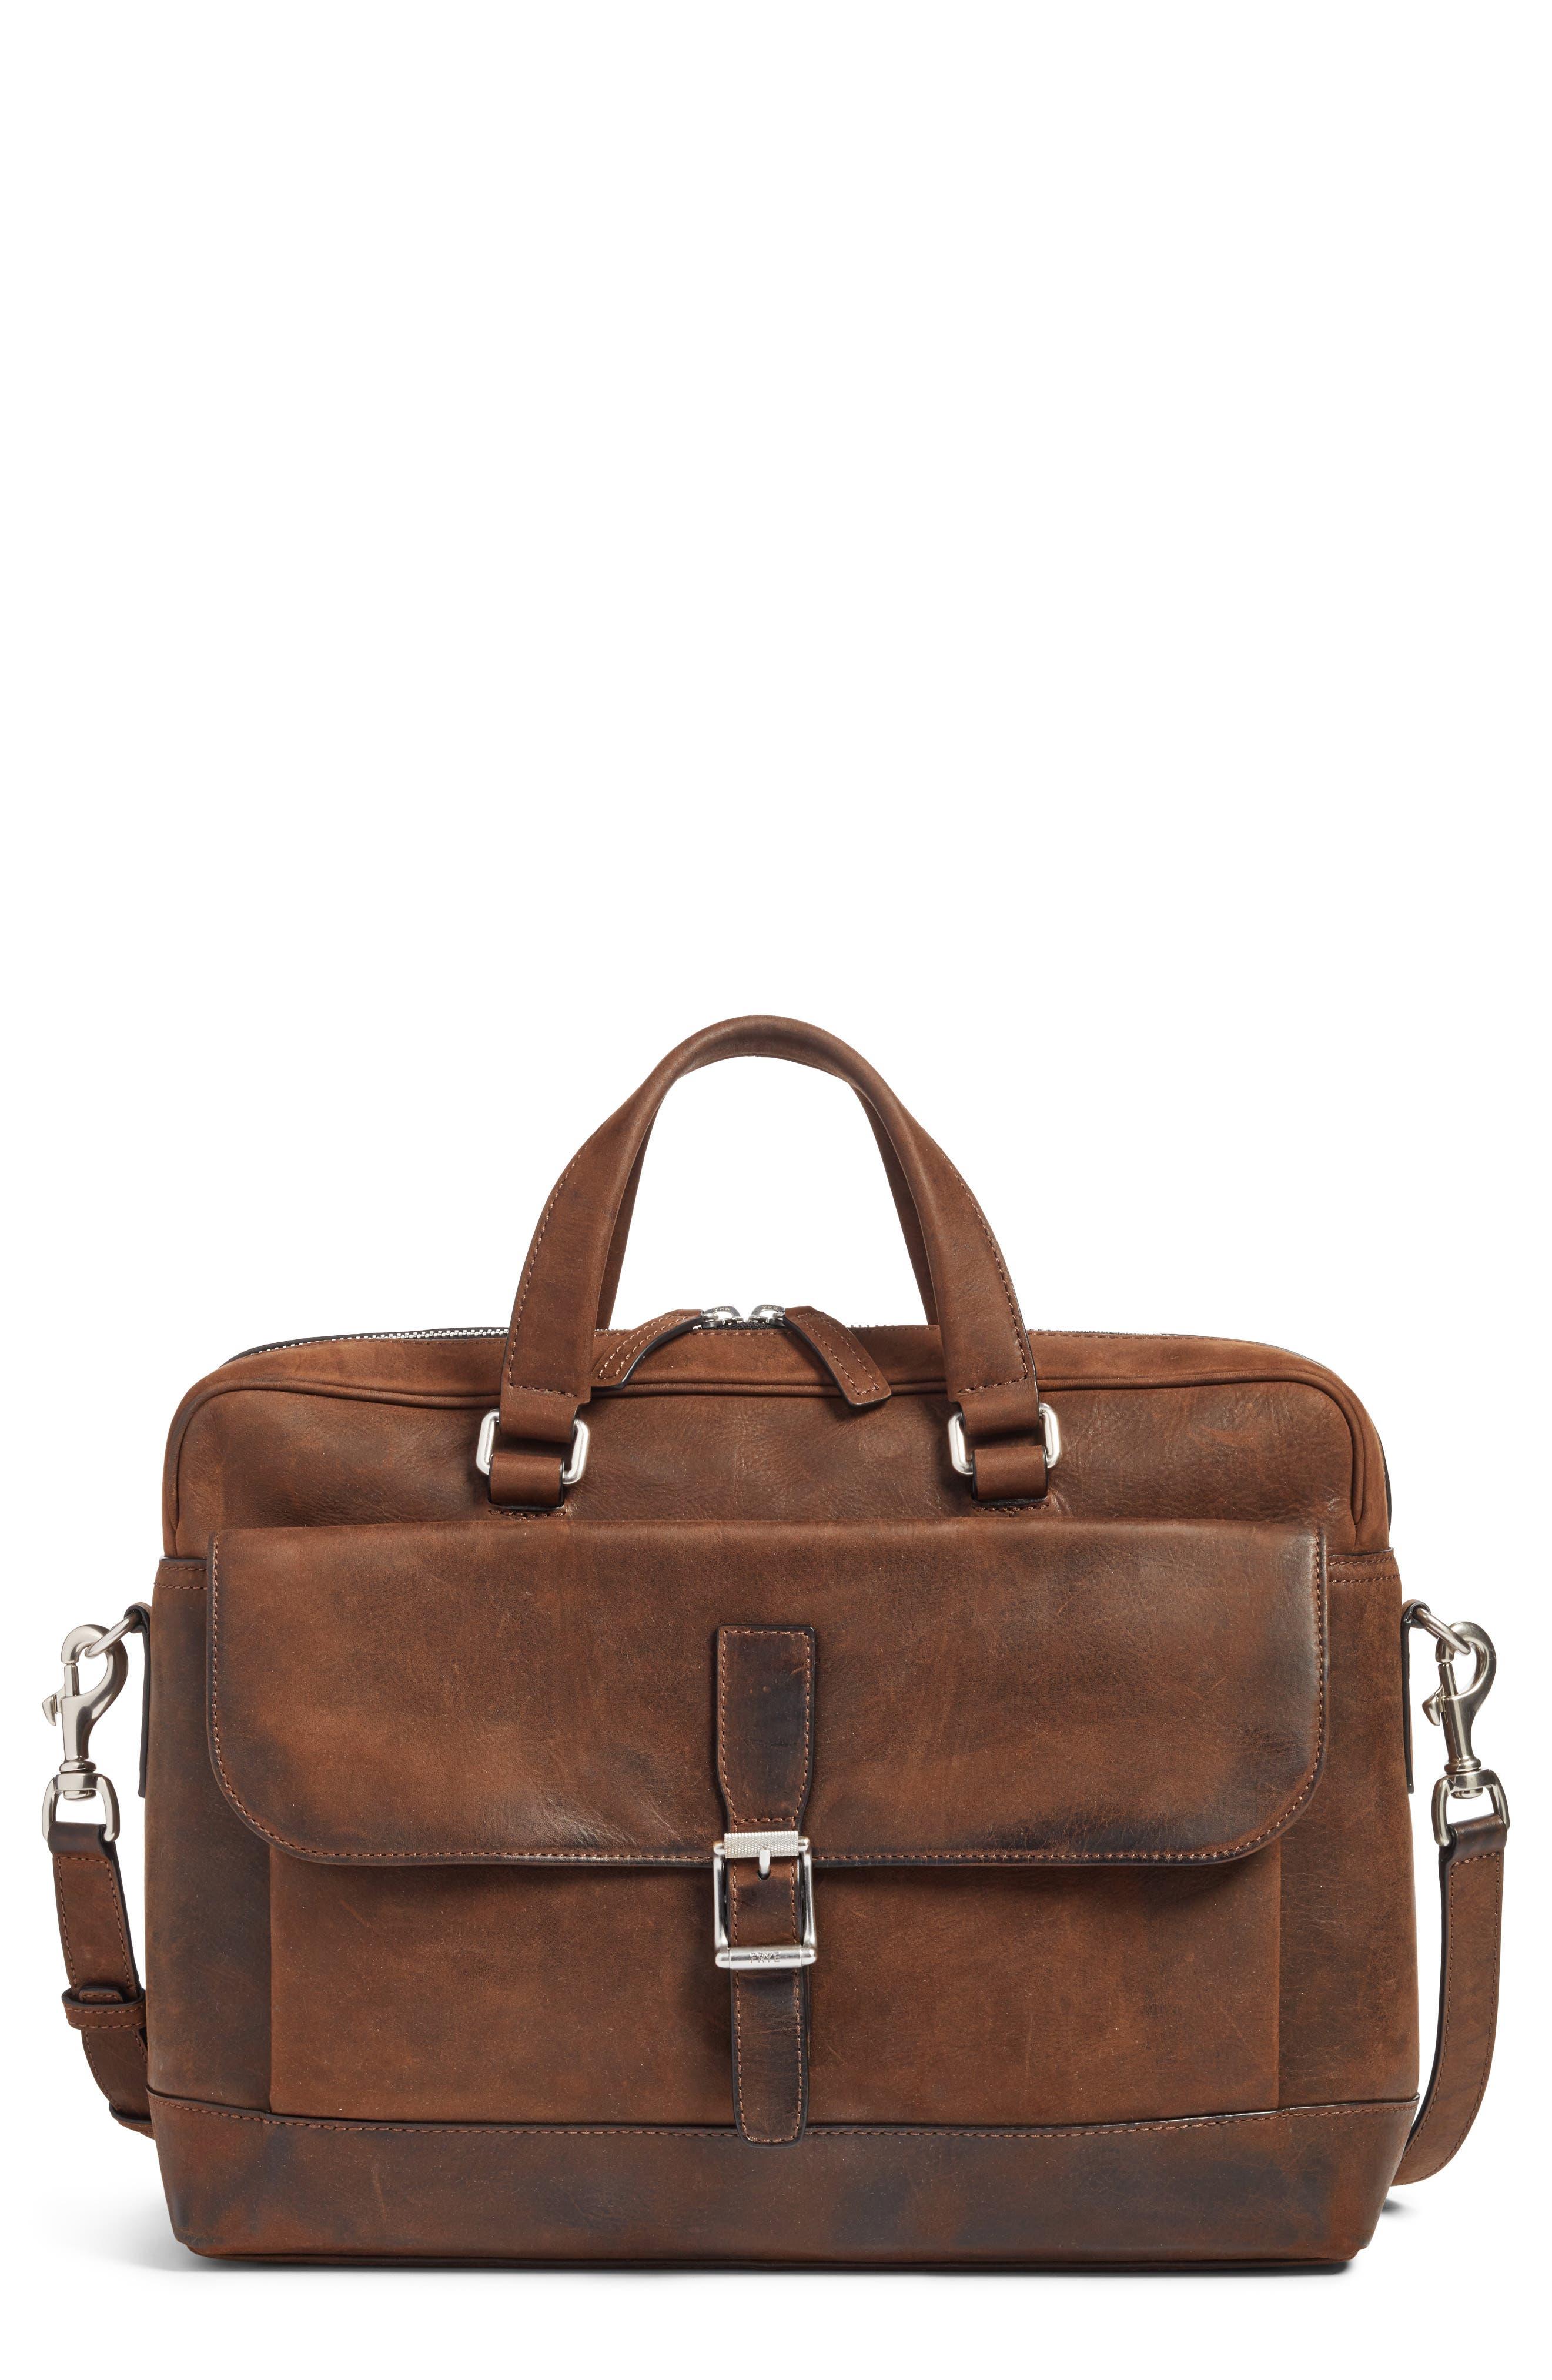 FRYE Oliver Leather Briefcase, Main, color, DARK BROWN